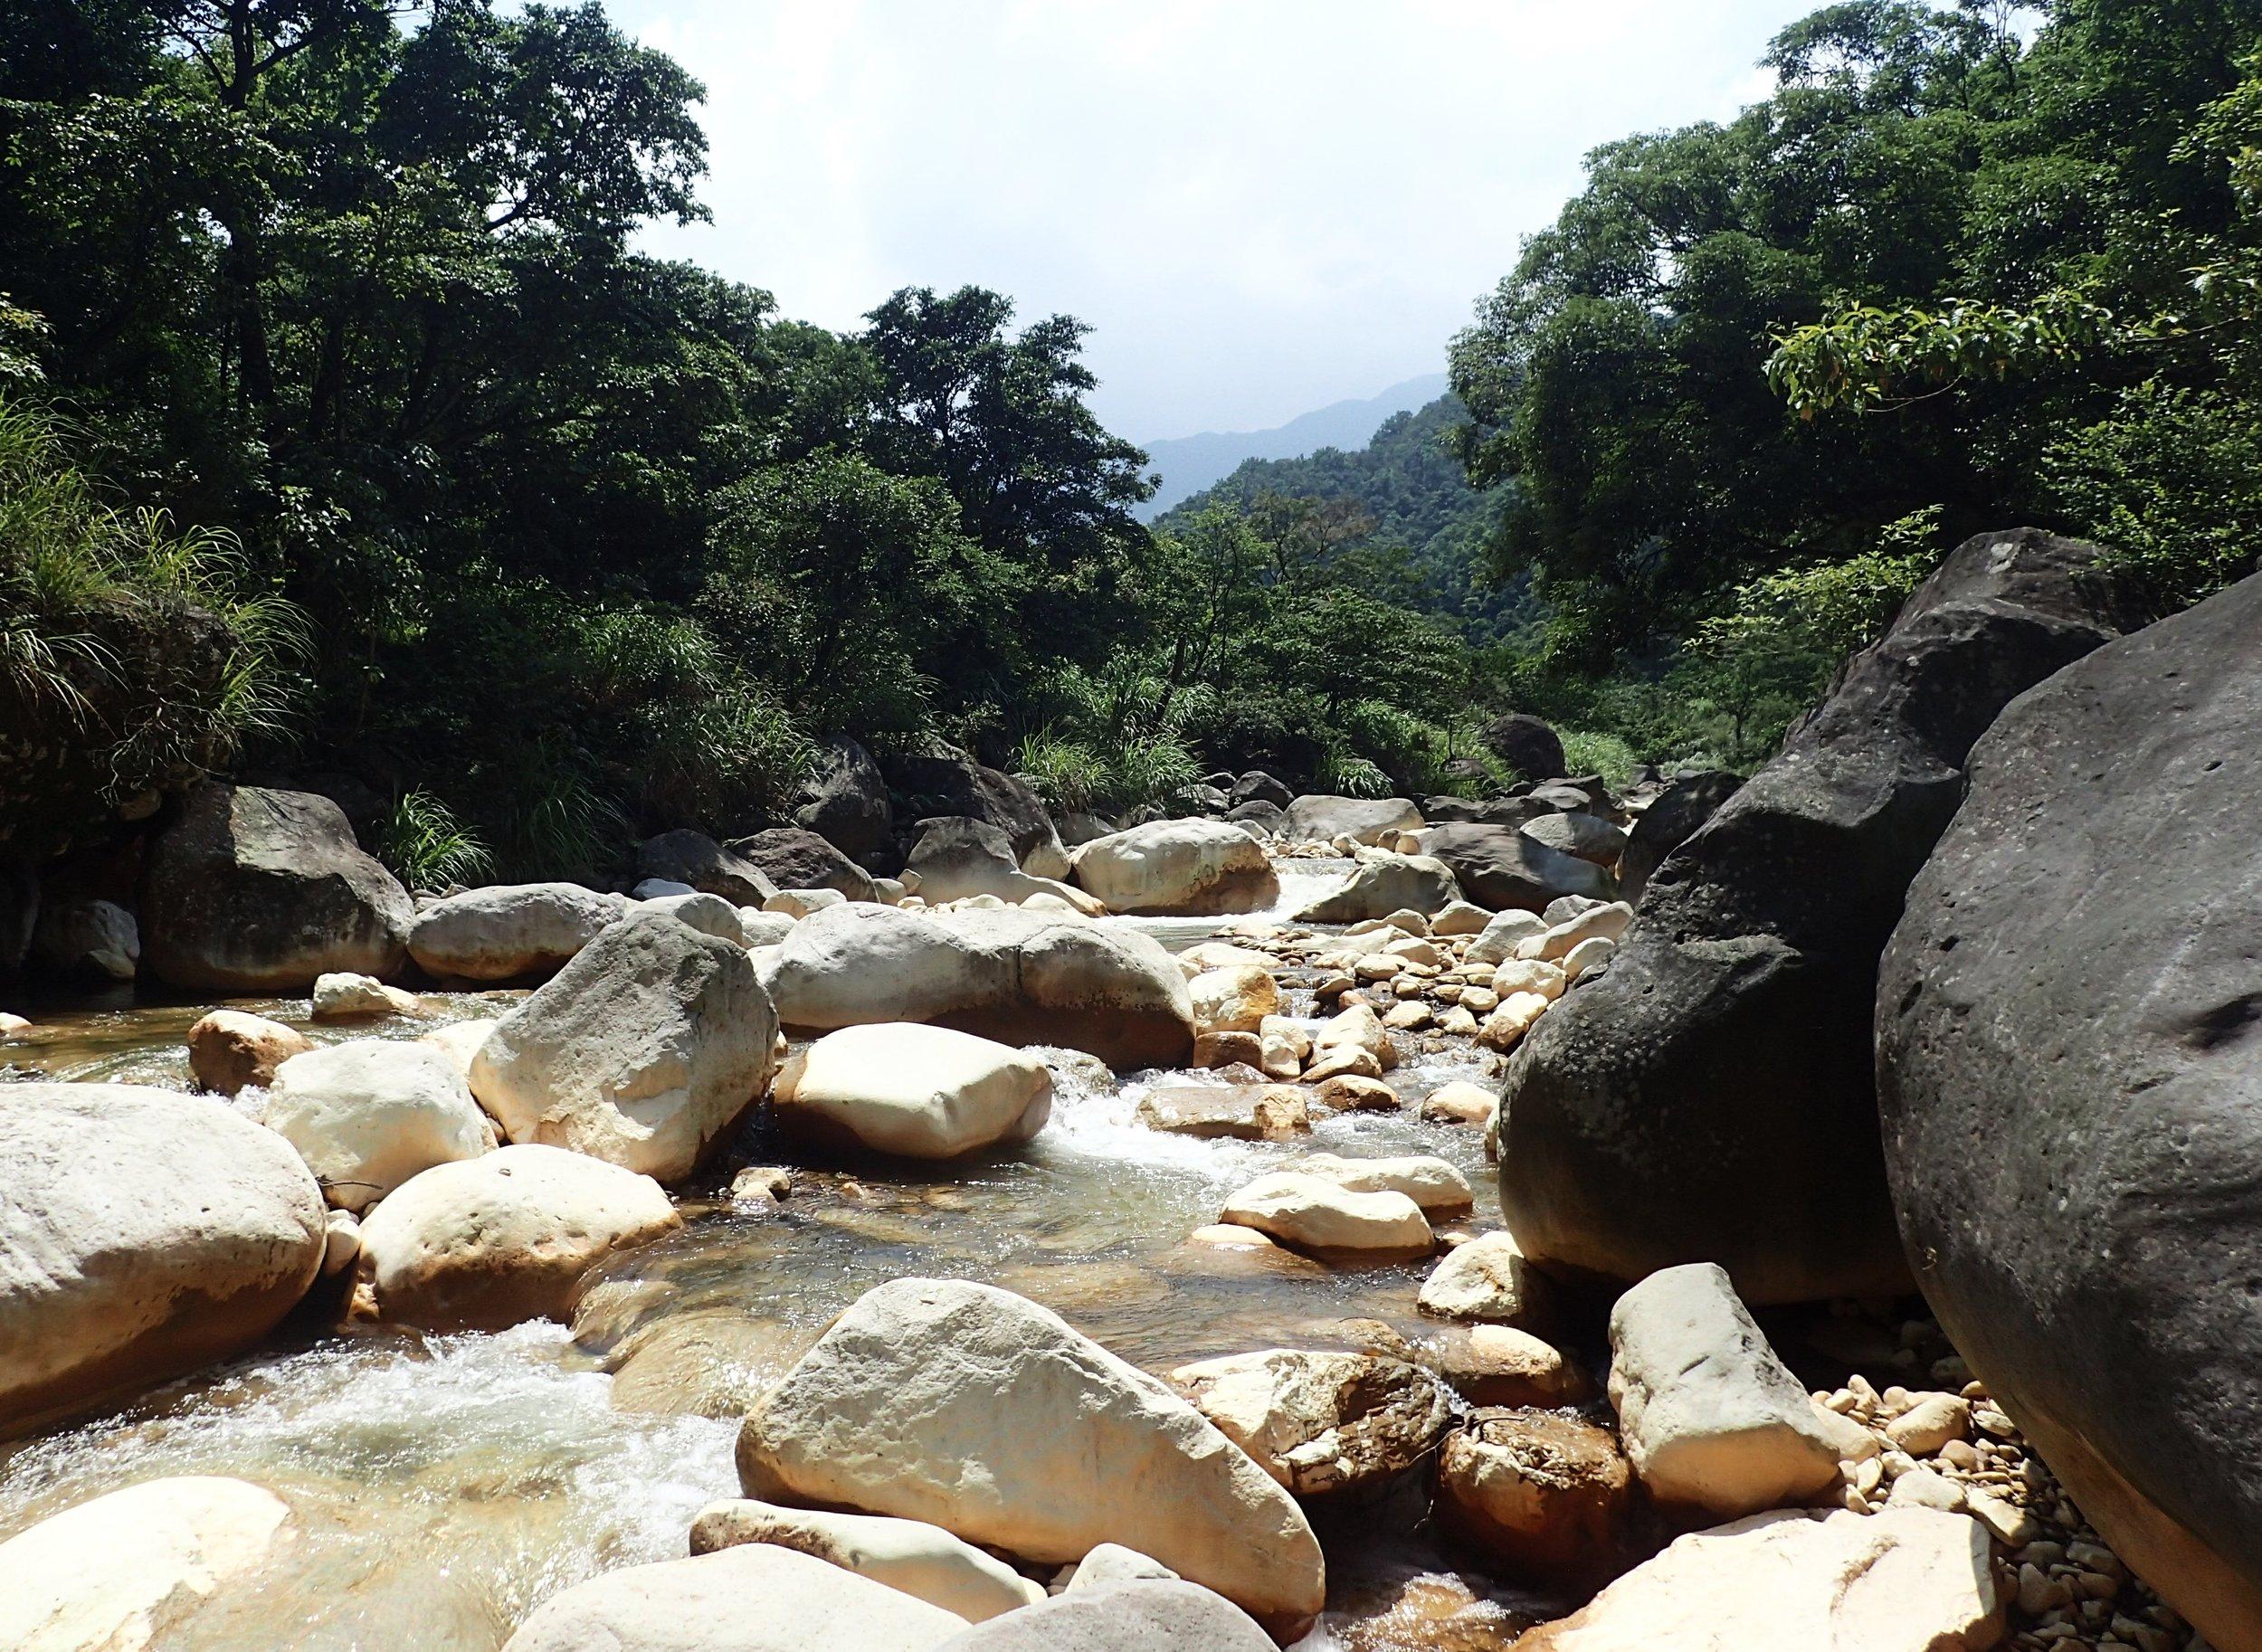 The Huangxi above the Bayan Creek